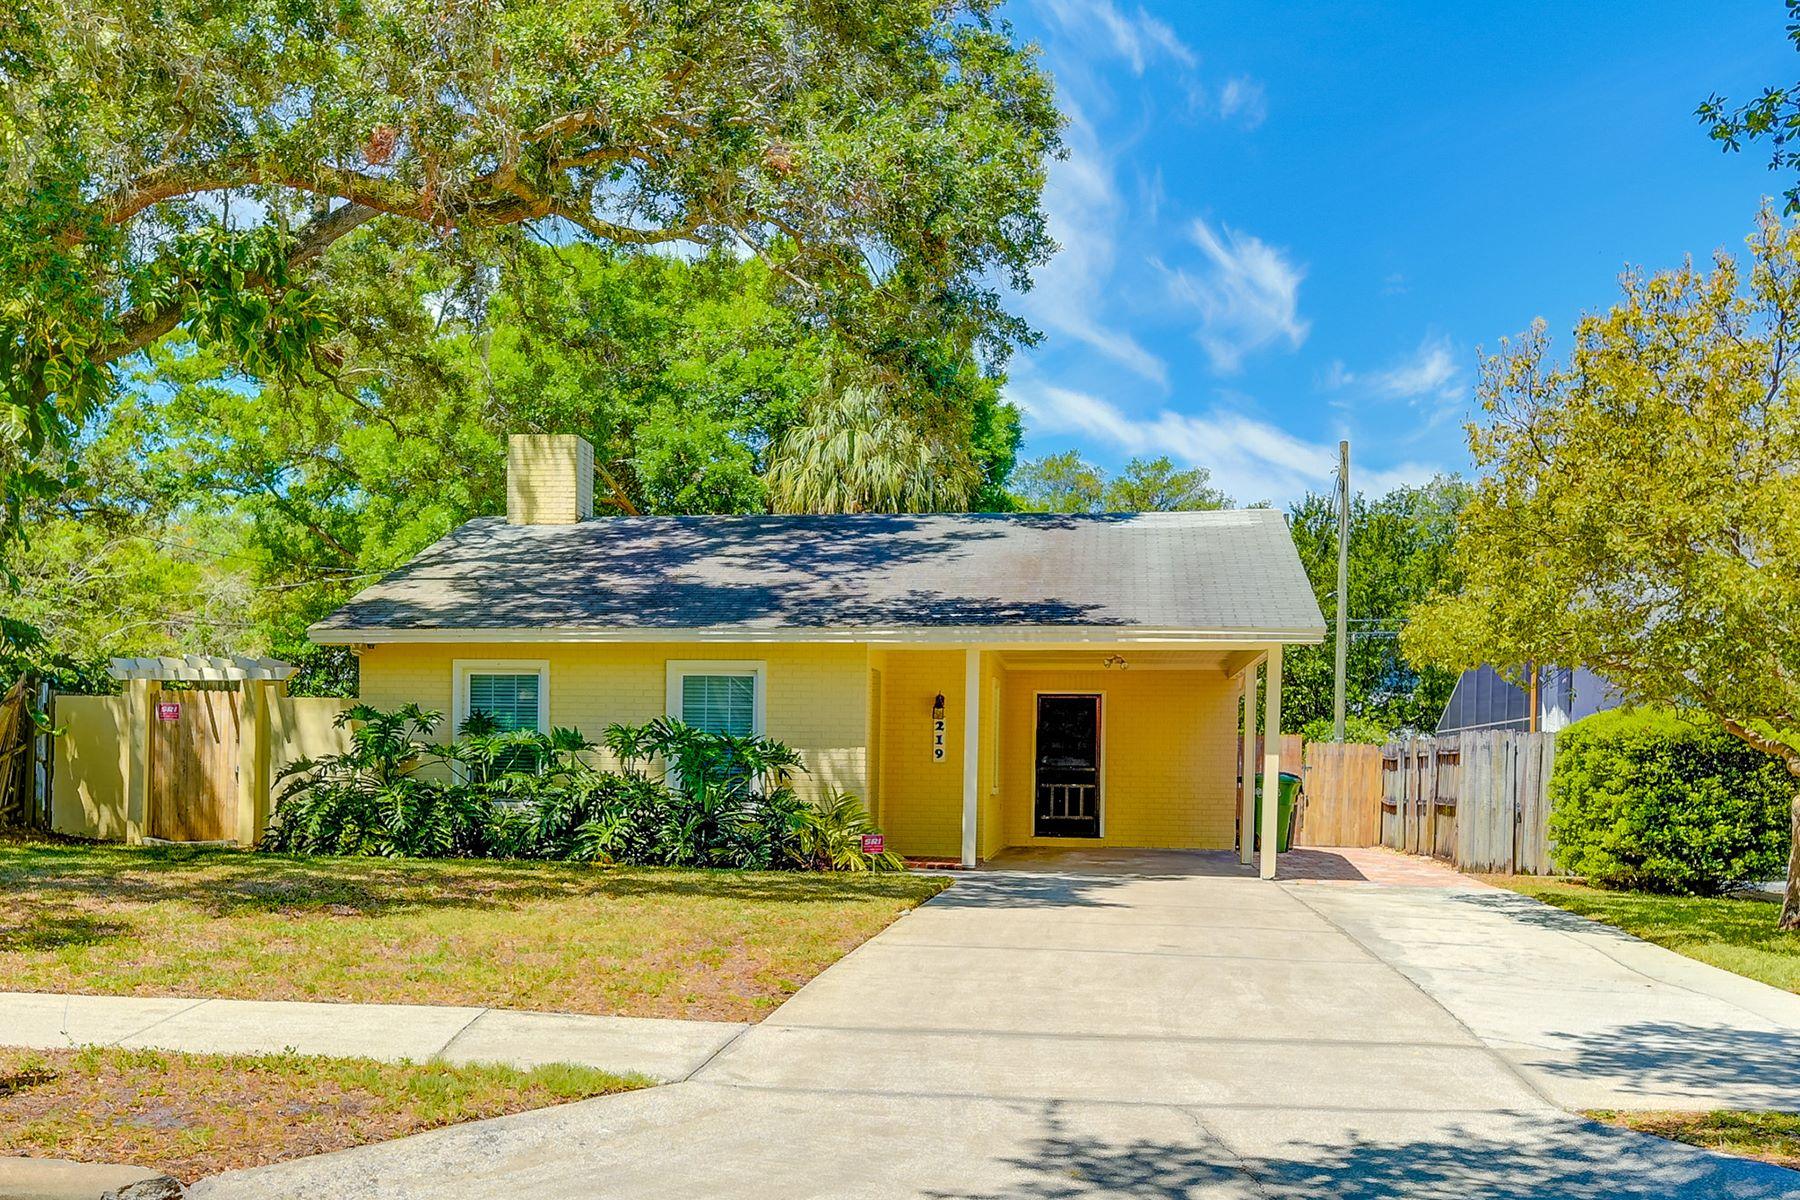 獨棟家庭住宅 為 出售 在 SOUTH TAMPA 219 S Hale Ave Tampa, 佛羅里達州, 33609 美國